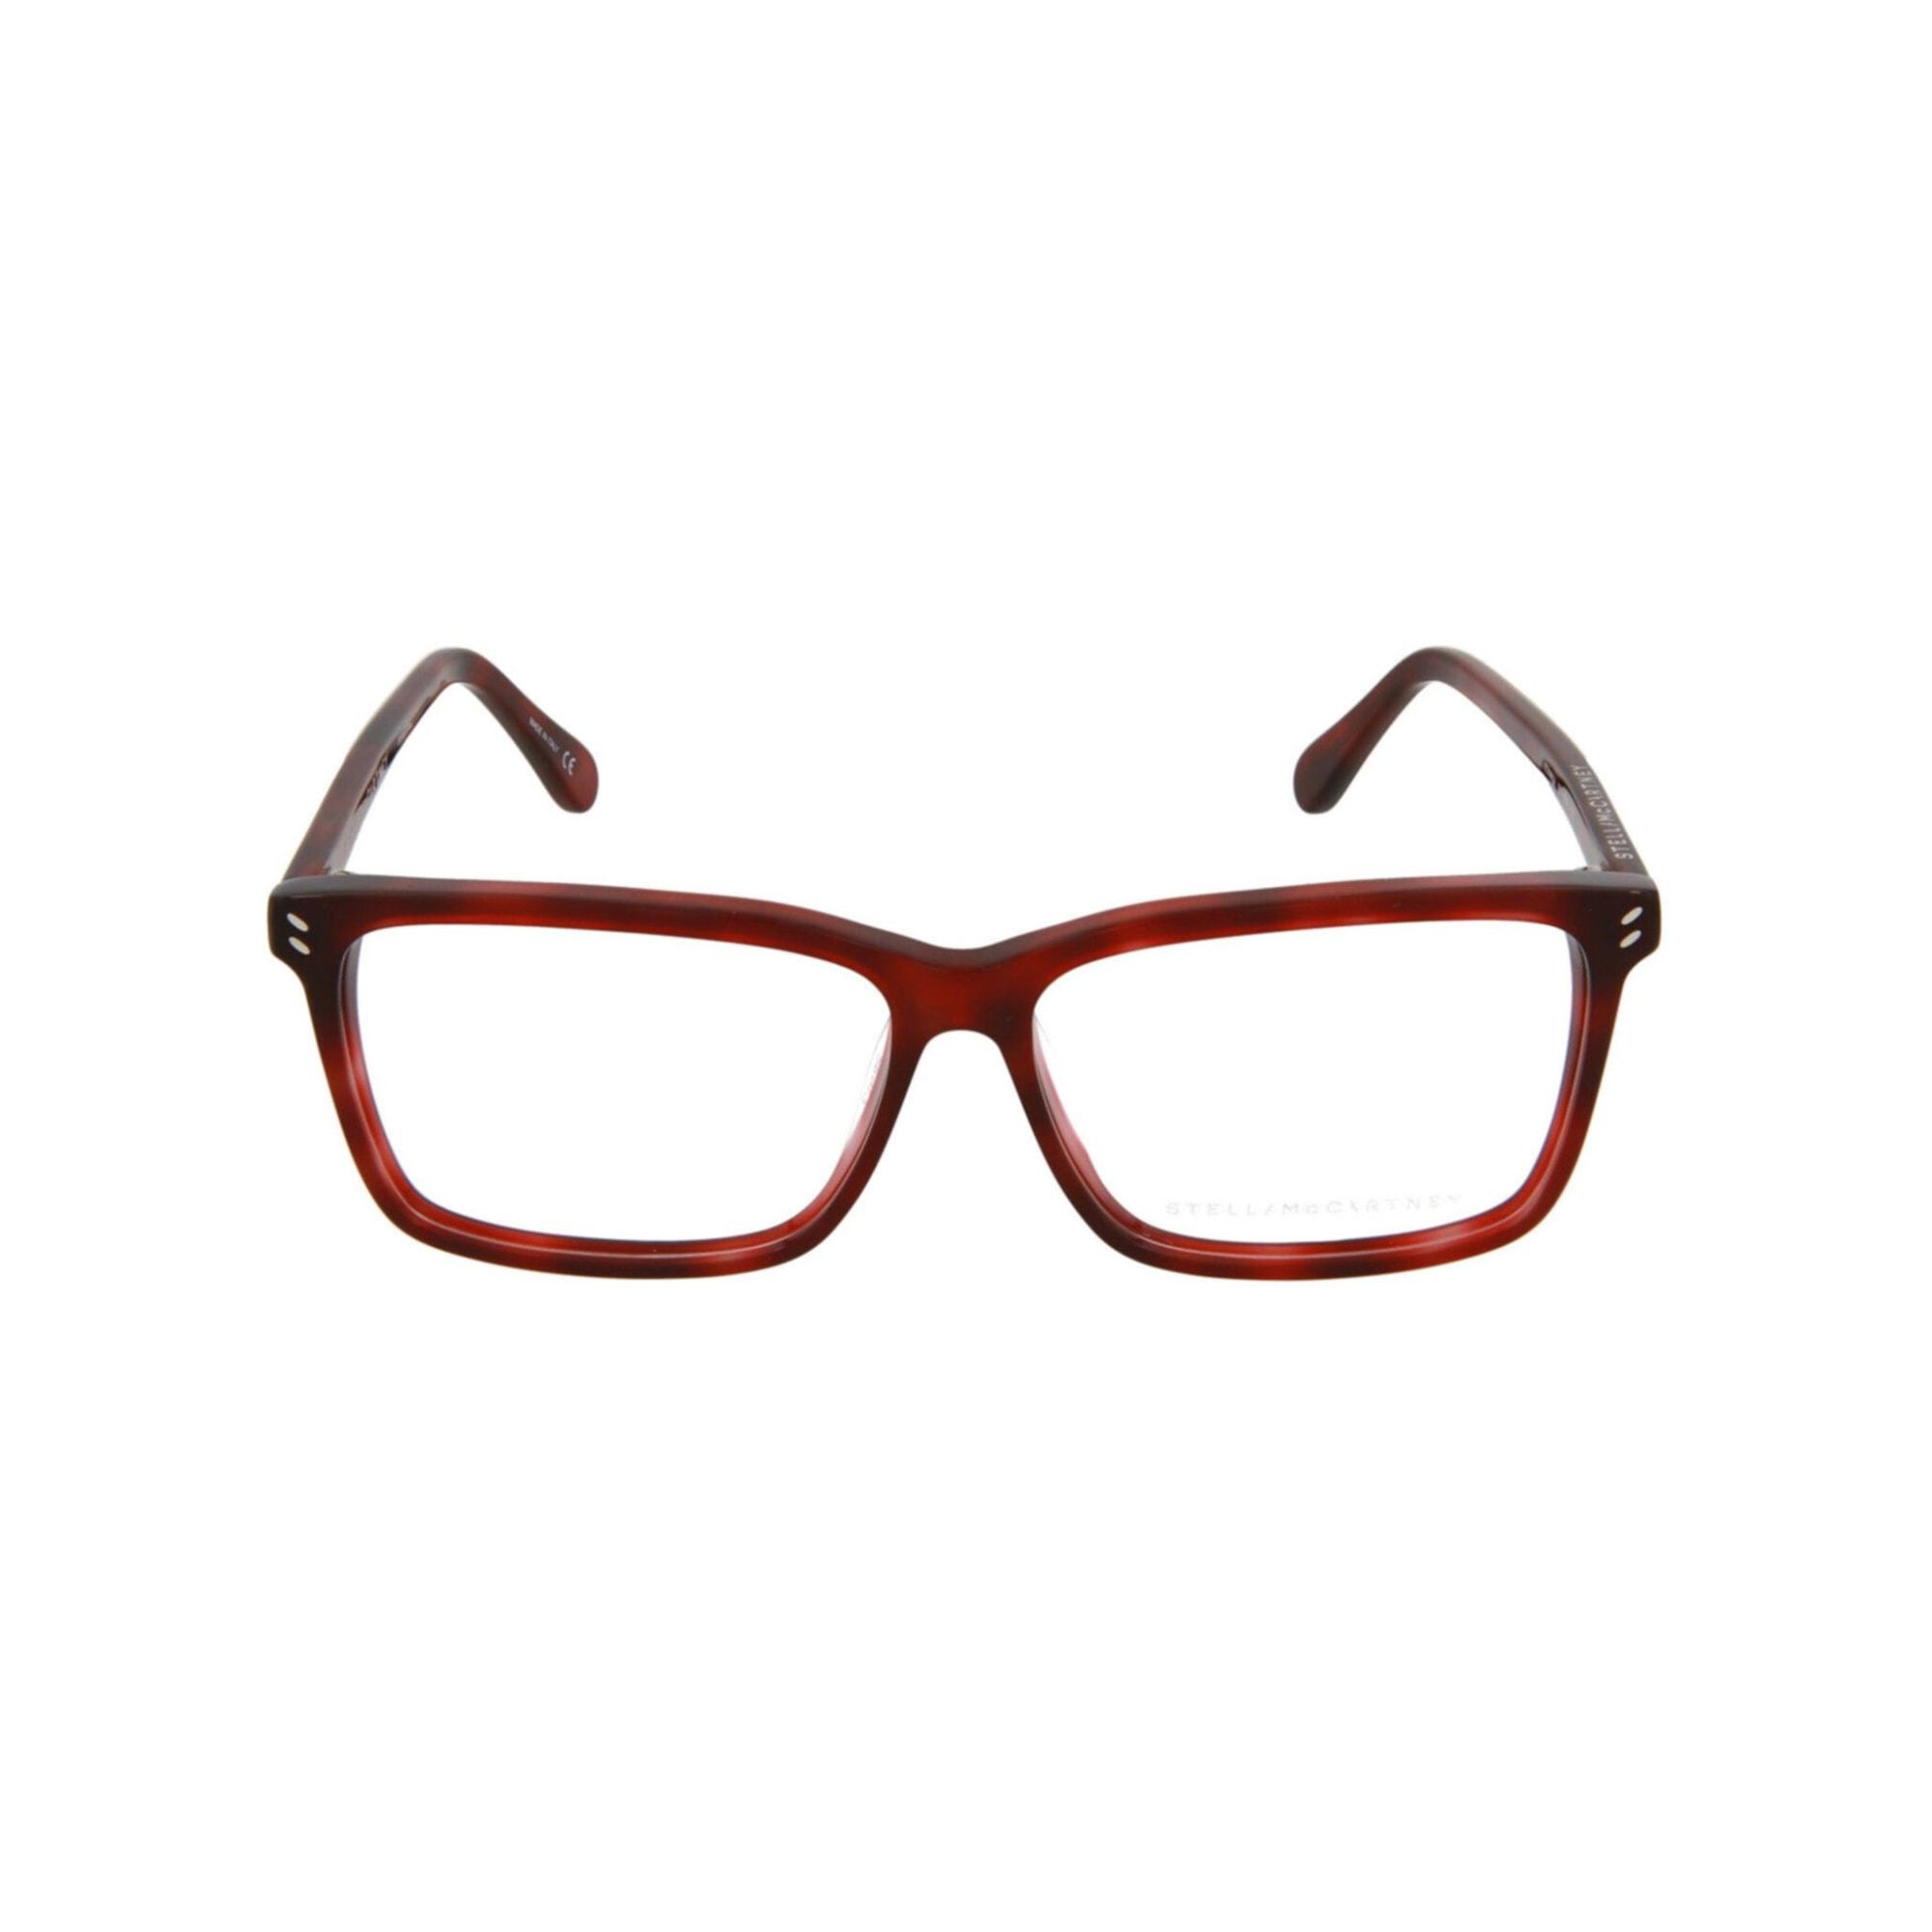 Sonnenbrille STELLA MCCARTNEY Rot, bordeauxrot